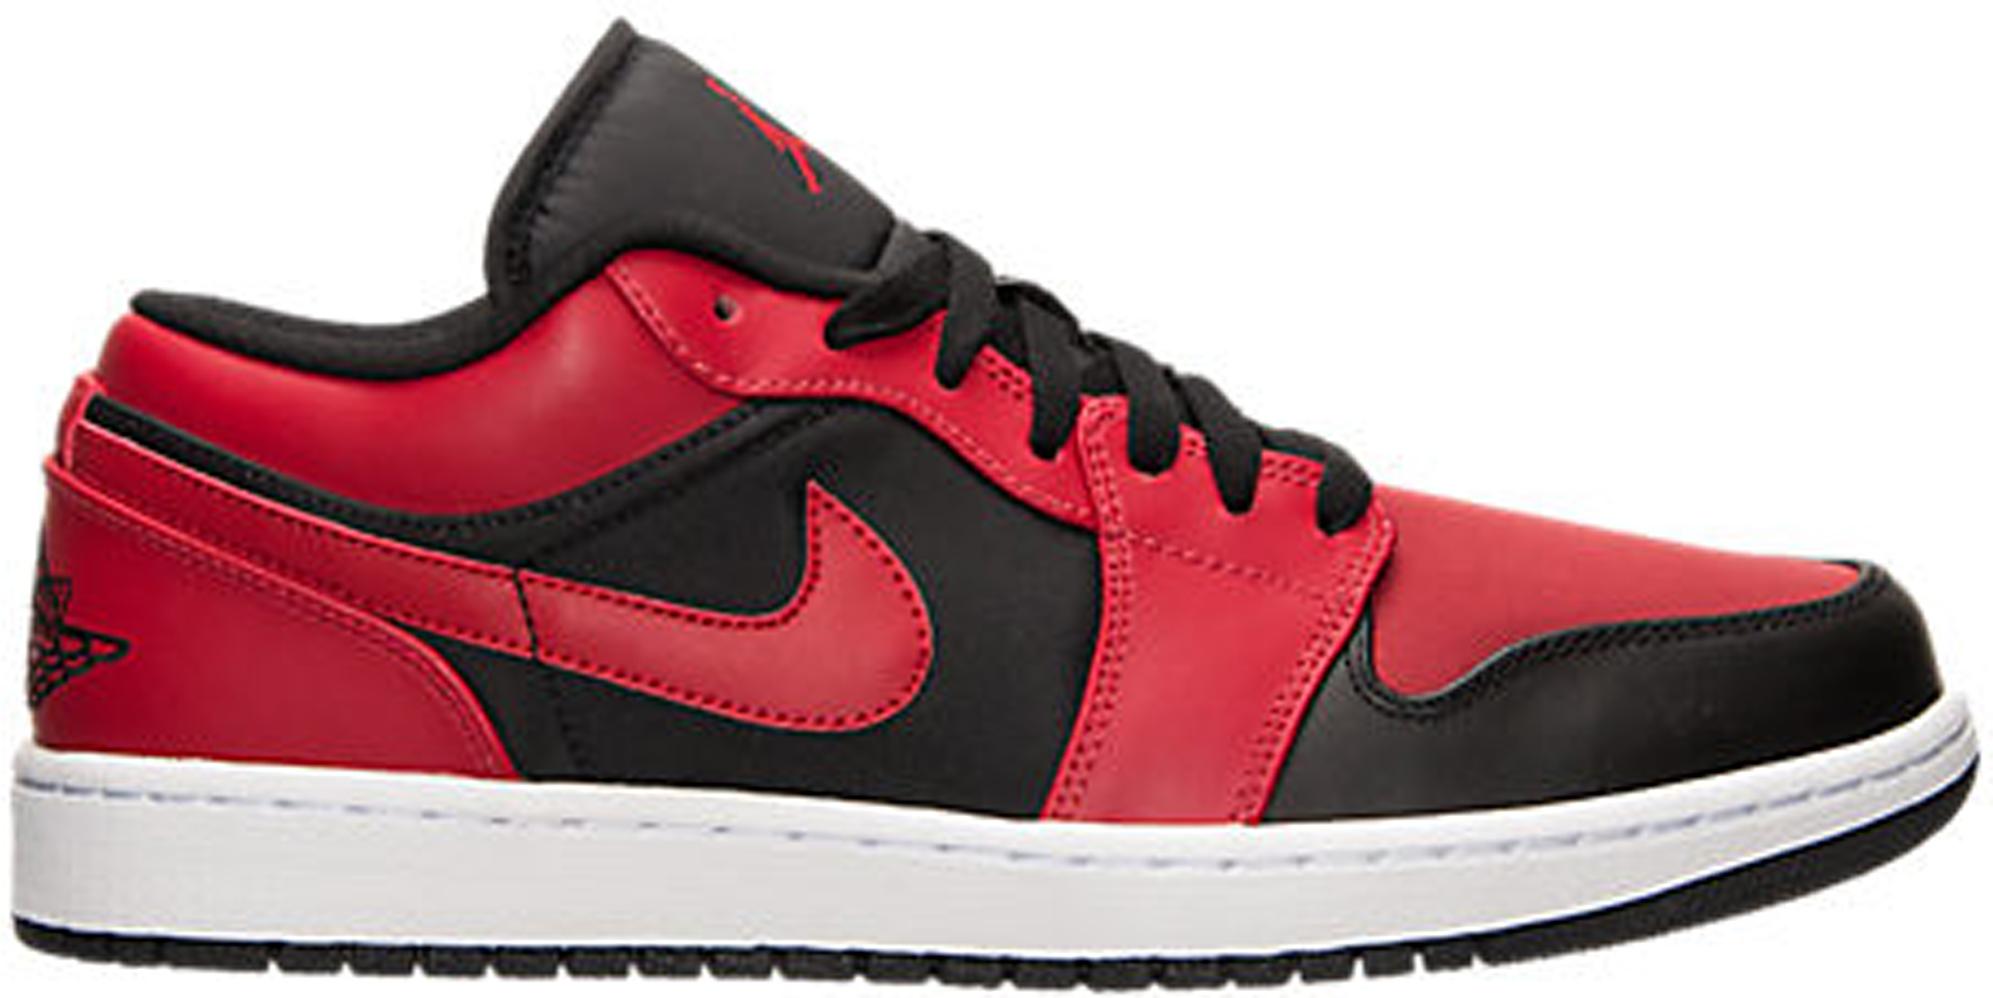 Jordan 1 Retro Low Black Gym Red